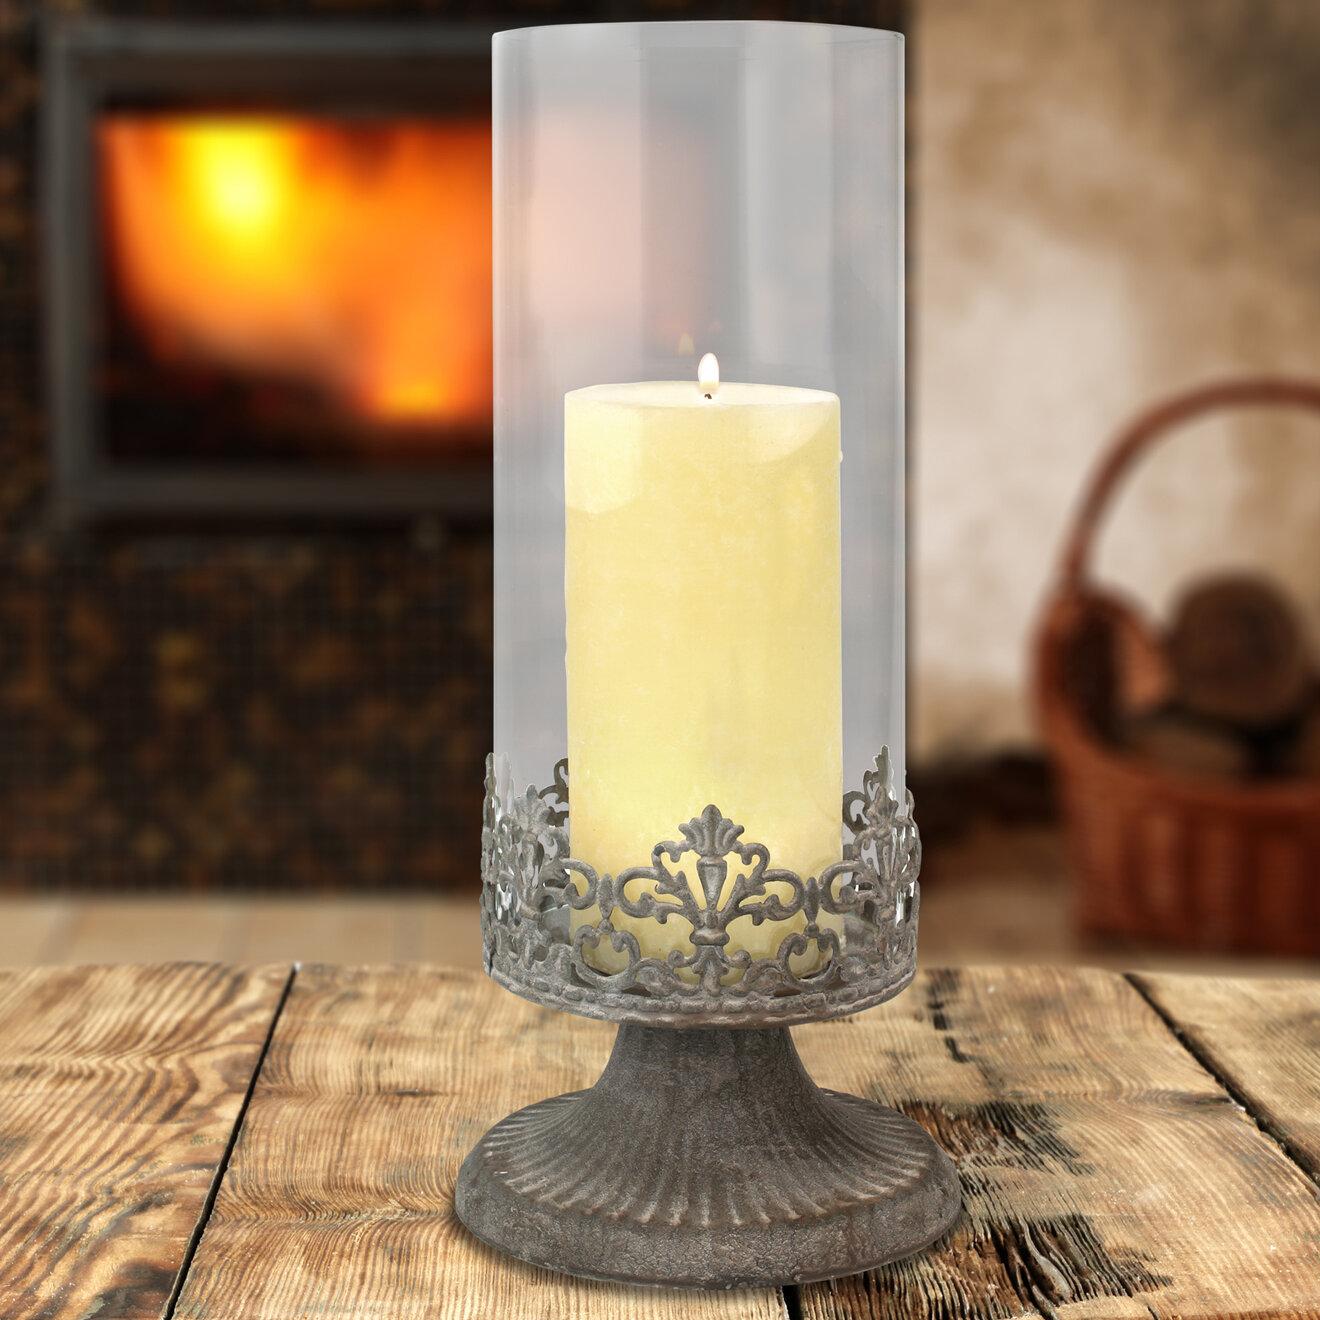 Lark Manor Cottage Zinc Filigree Glass And Metal Hurricane Reviews Wayfair